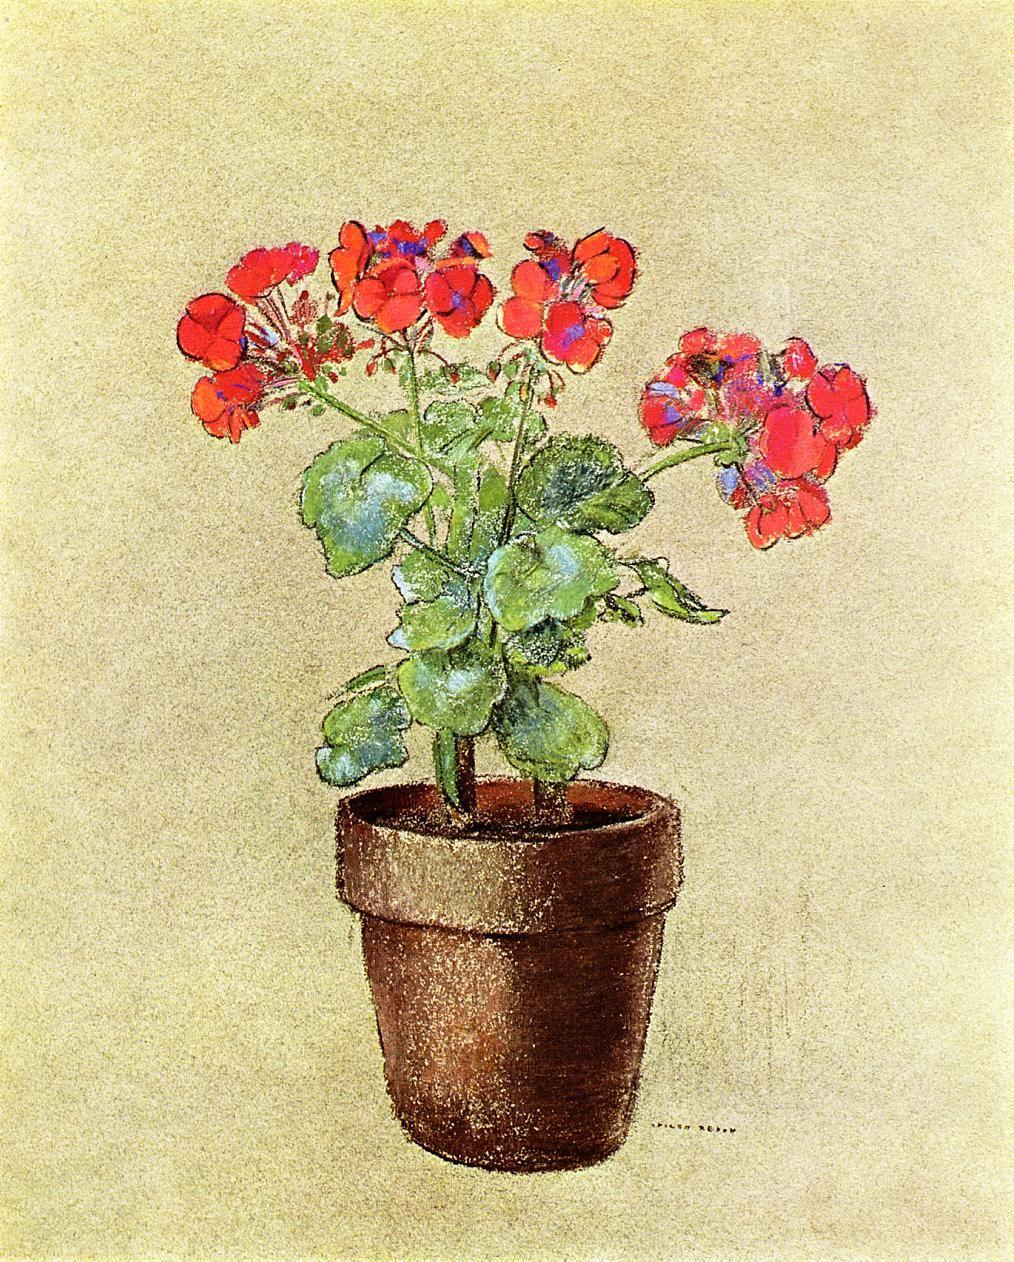 """ Geraniums via Odilon Redon Size: 49.53x40.64 cm Medium: pastel on paper"""